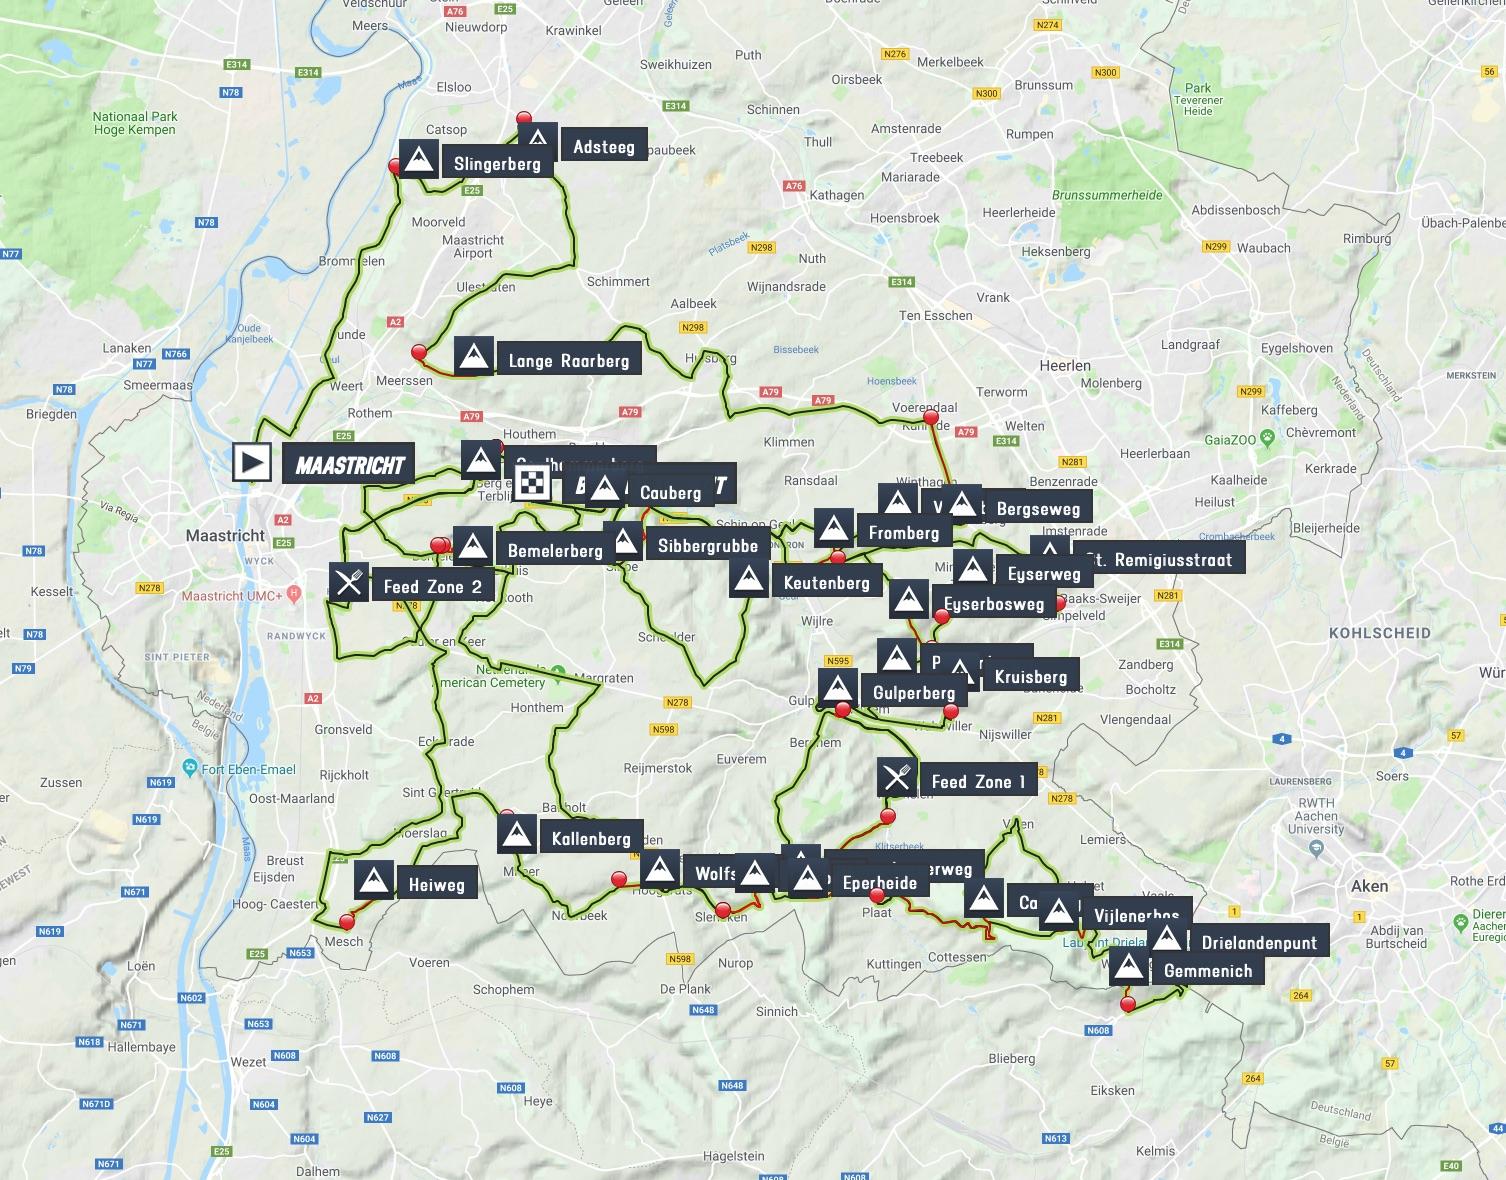 amstel-gold-race-2019-map-fc57d65ffb.jpg